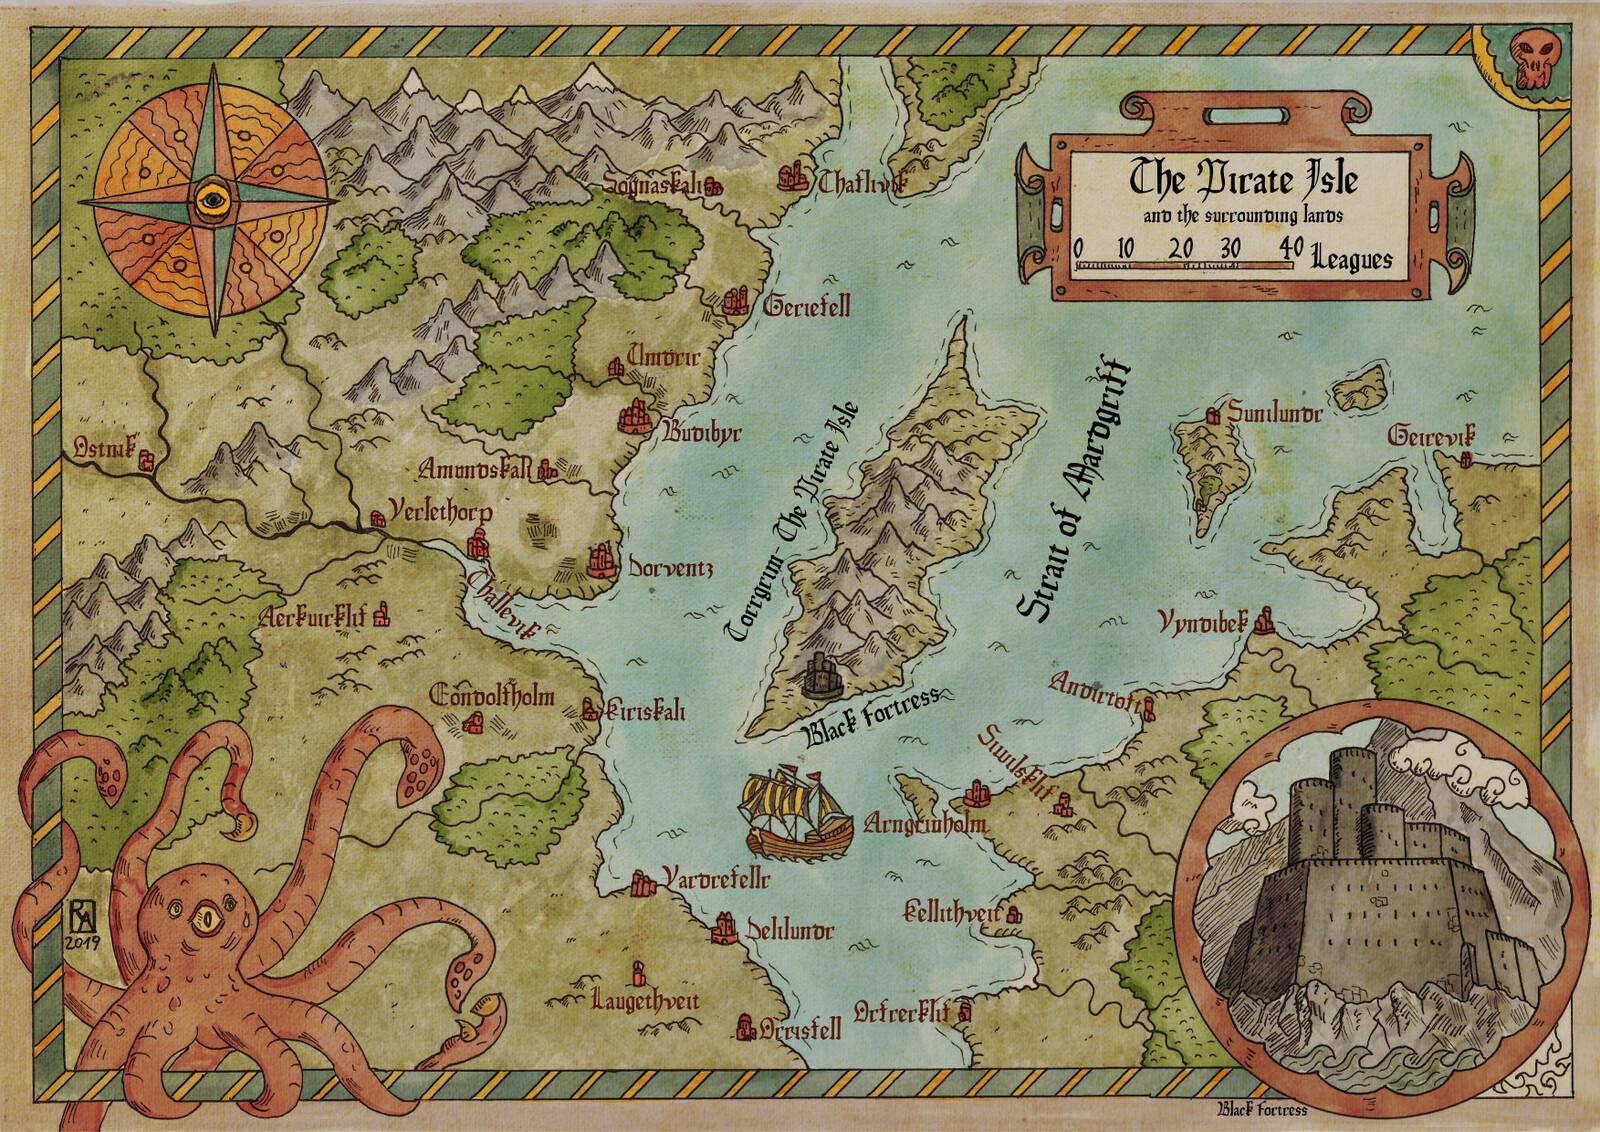 The Pirate Isle